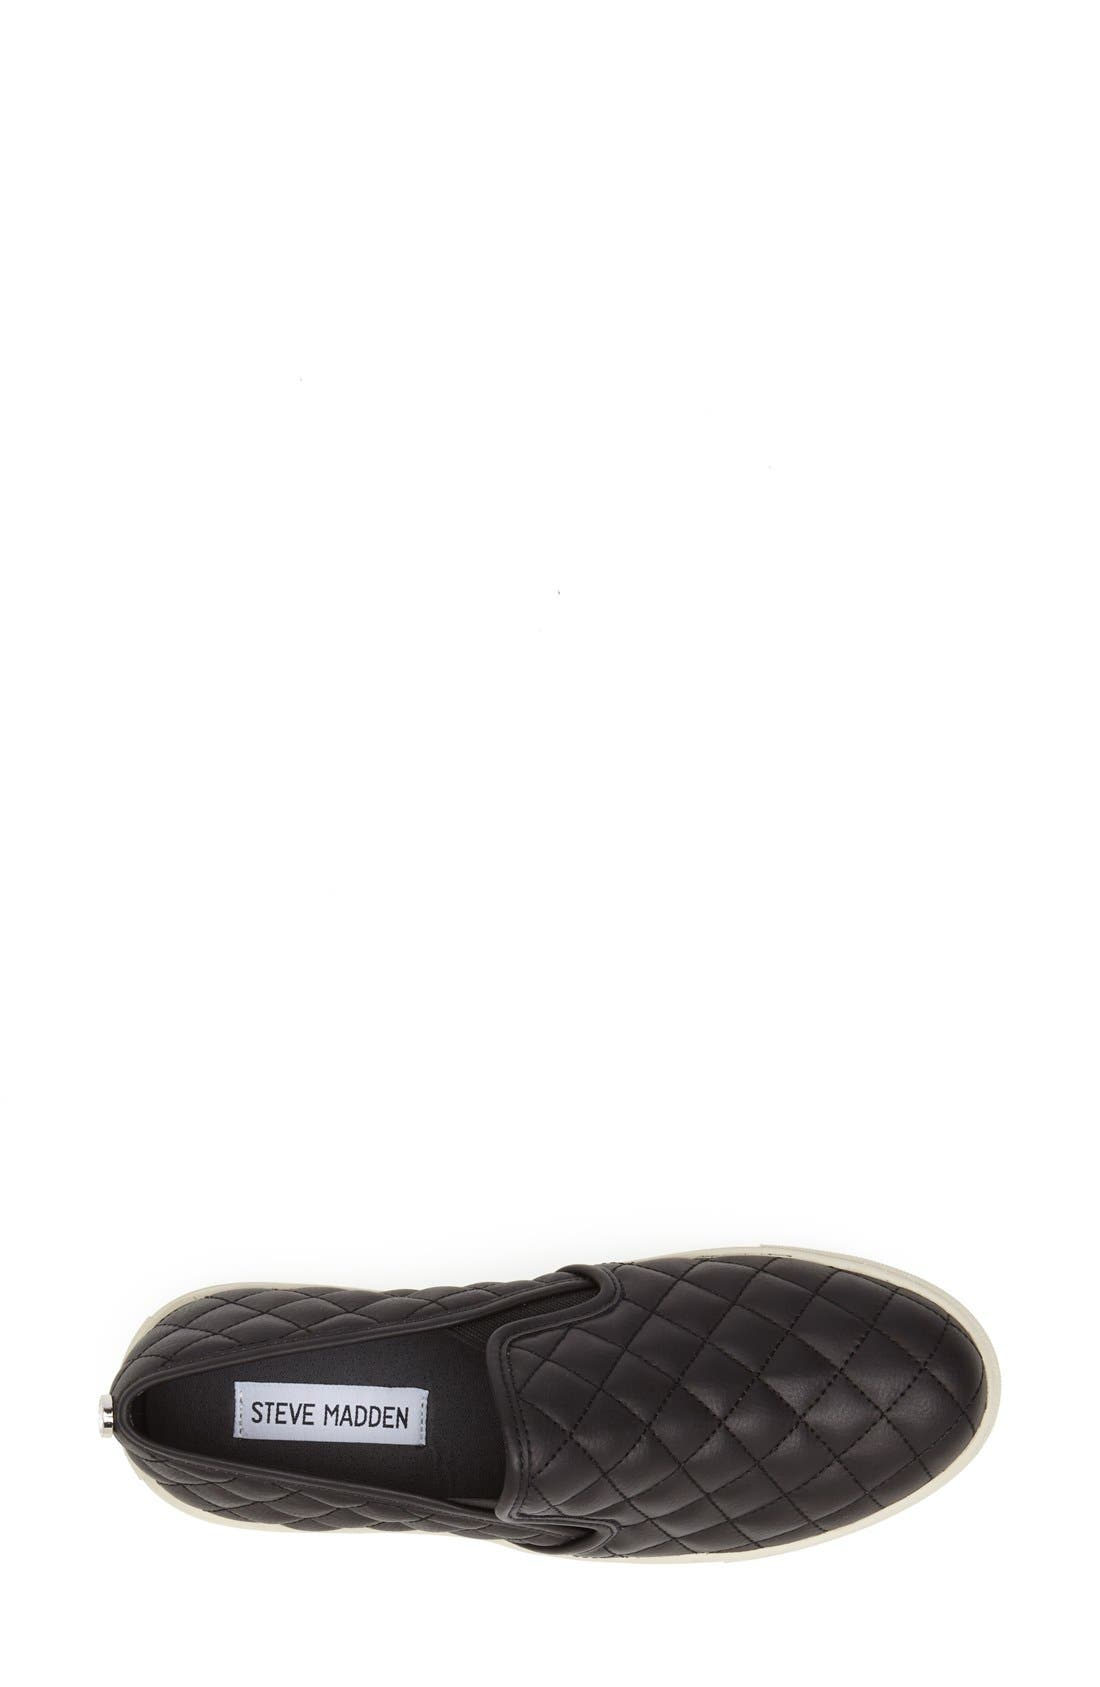 STEVE MADDEN,                             Ecentrcq Sneaker,                             Alternate thumbnail 2, color,                             BLACK FAUX LEATHER